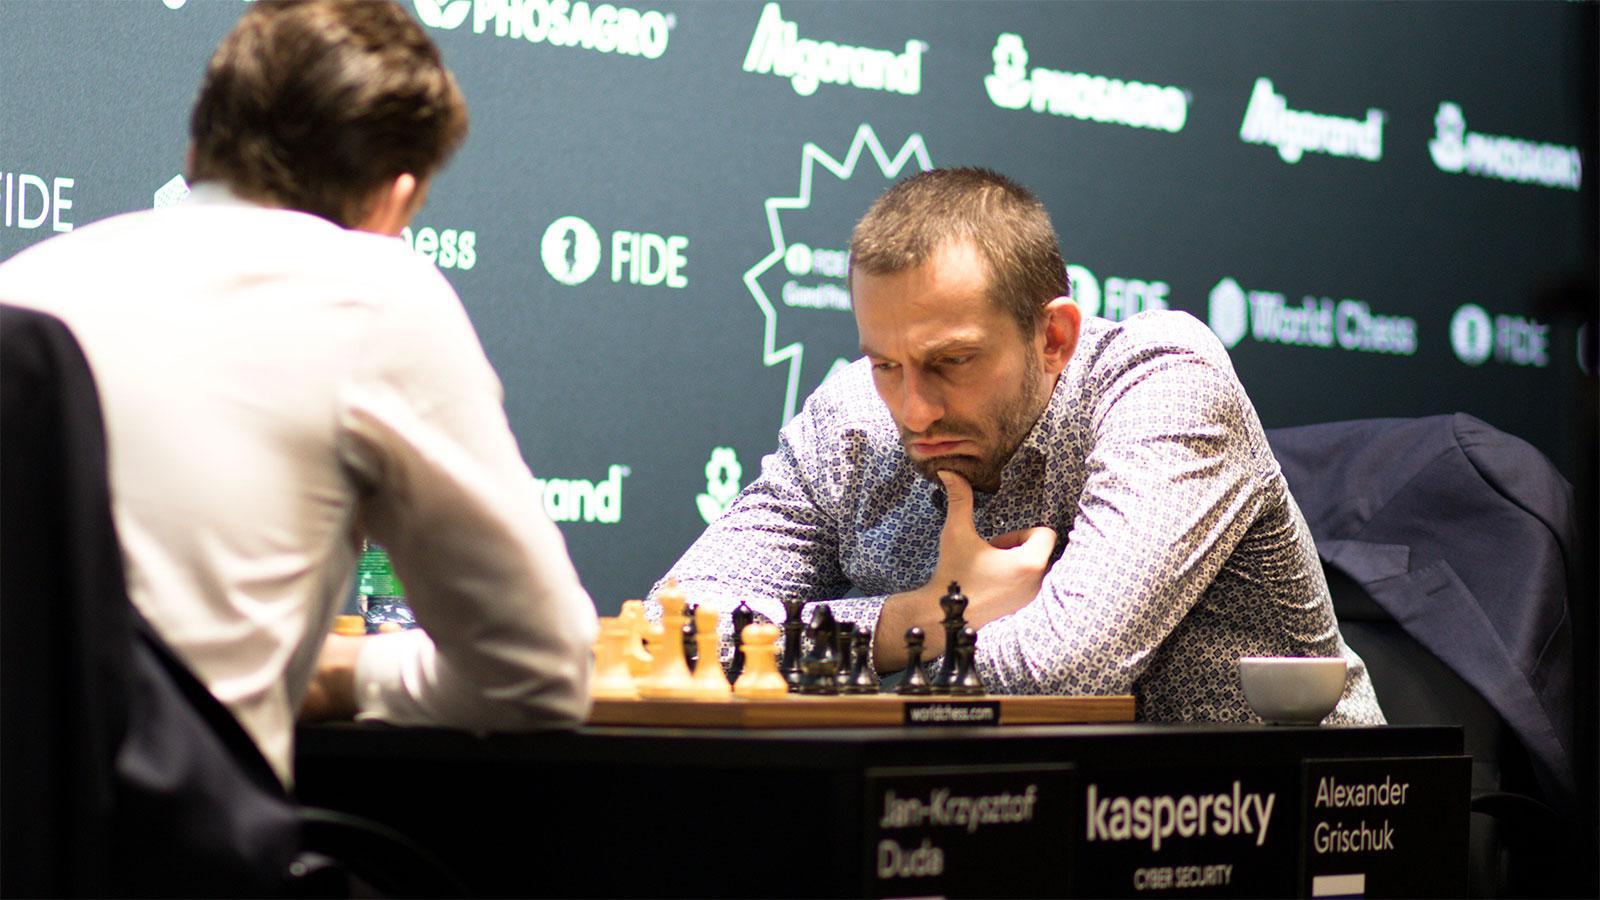 Grischuk Wins Hamburg Grand Prix, Almost Certain Of Candidates Qualification - Chess.com